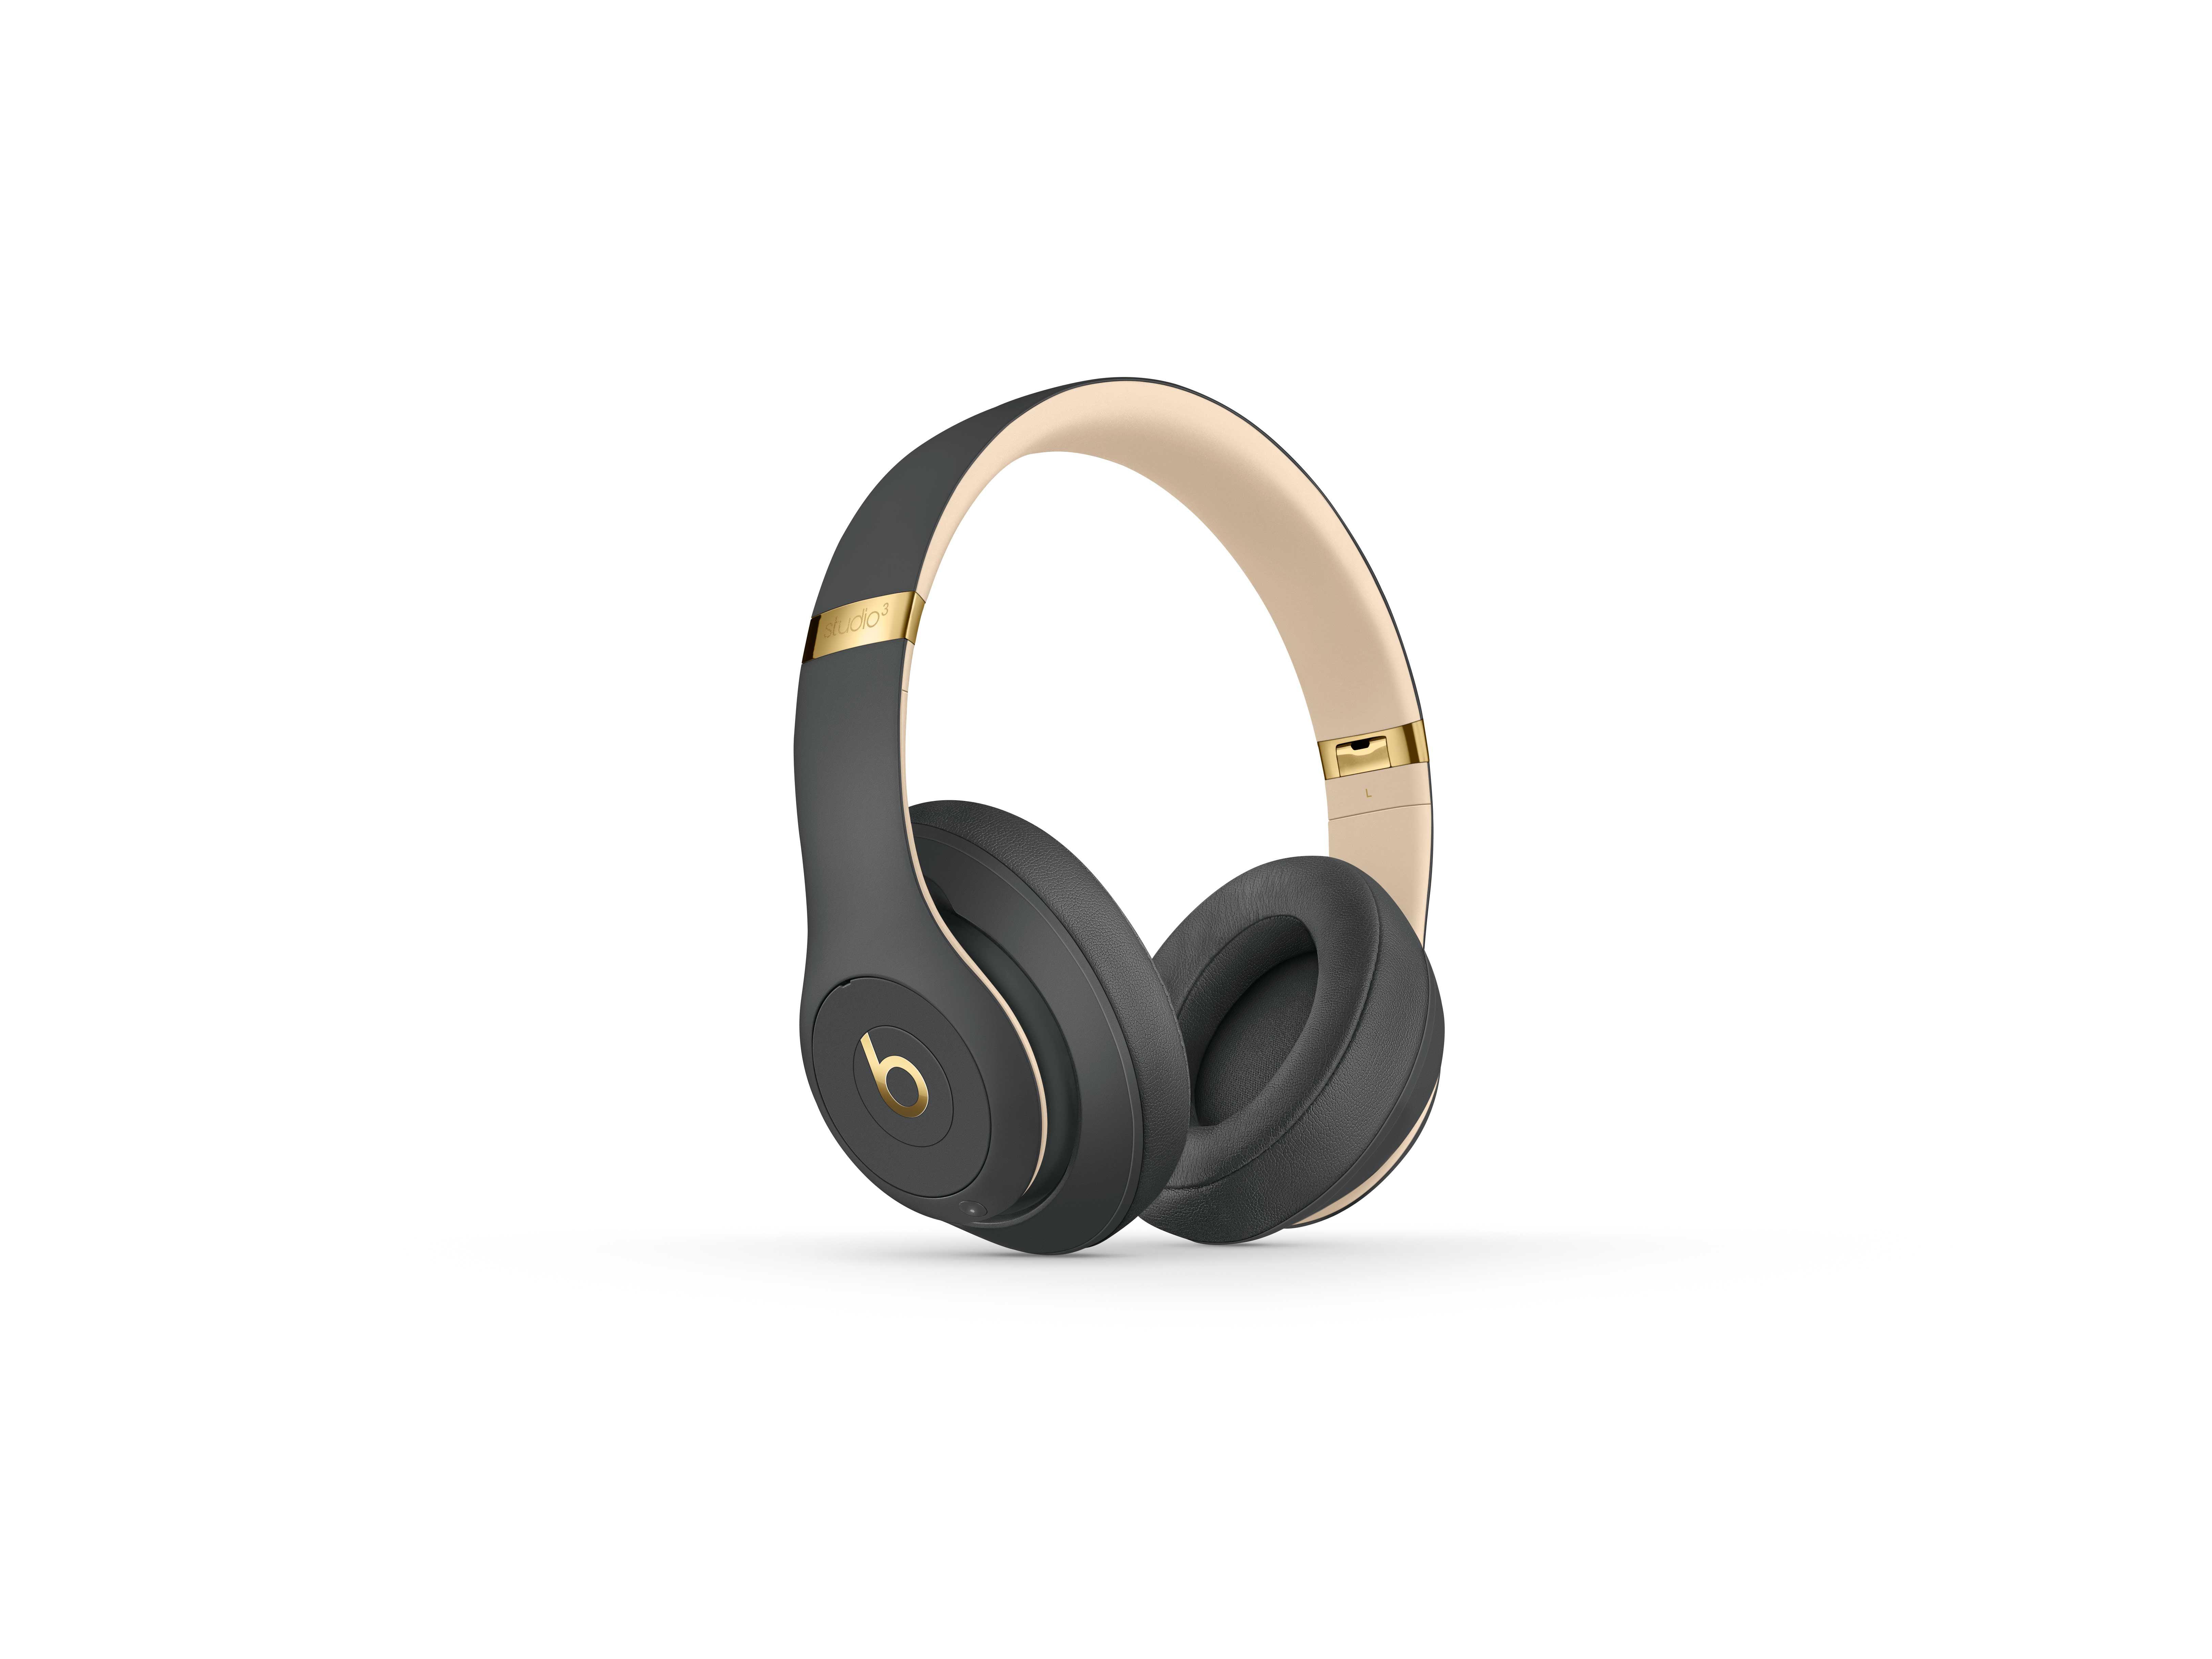 Beats Studio3 Wireless Over Ear Noise Cancelling Headphones Matte Black Refurbished Walmart Com Walmart Com